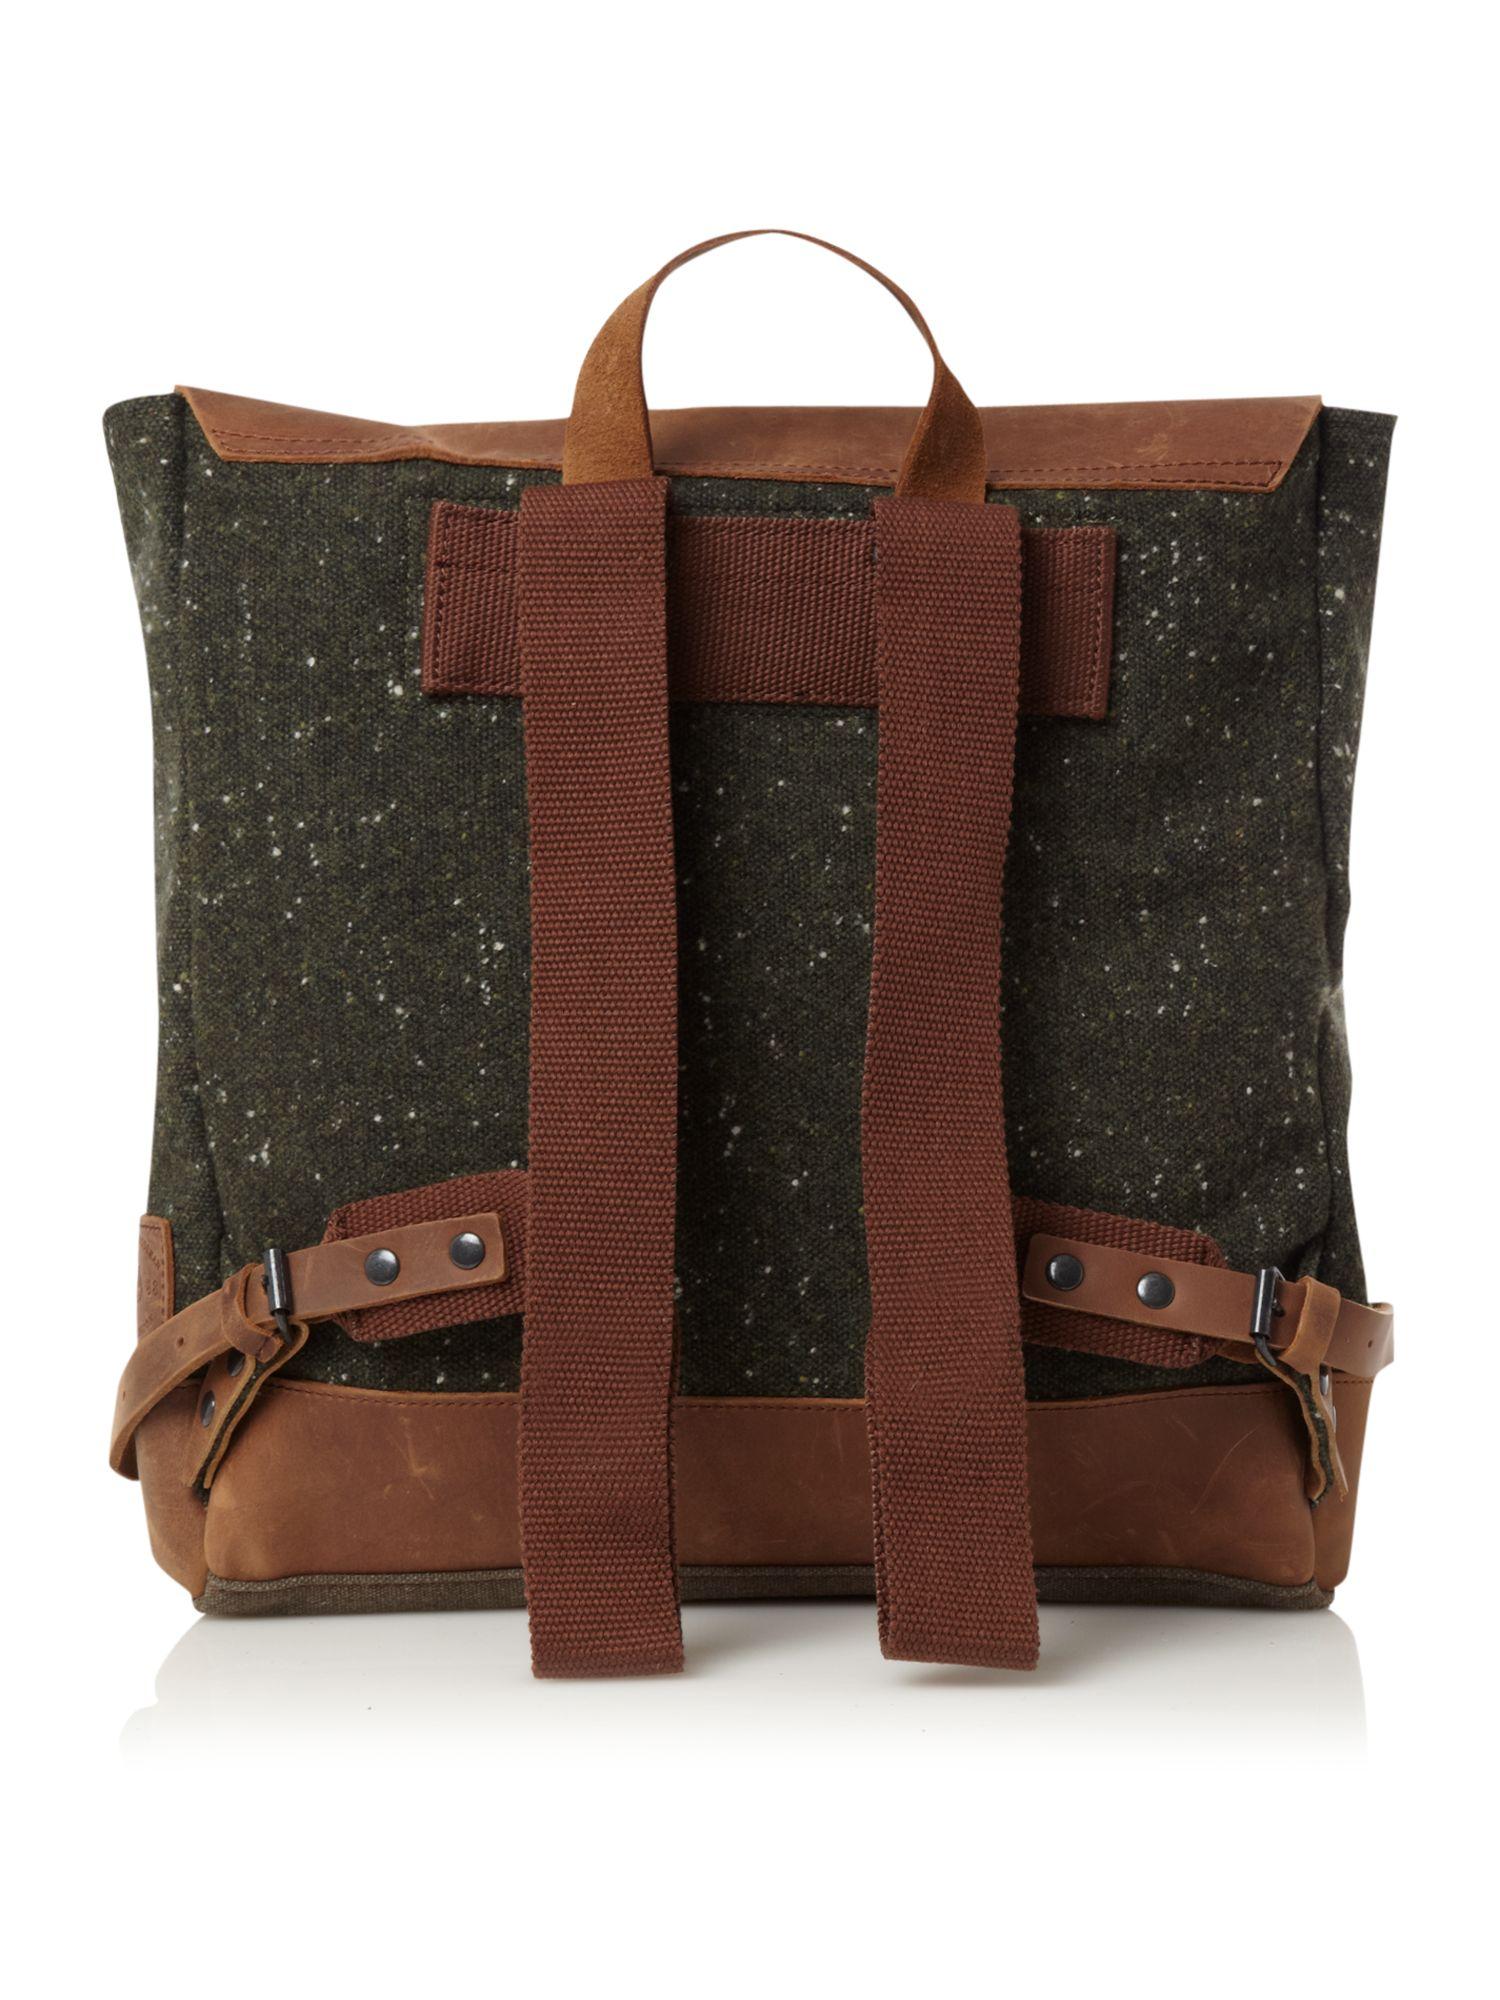 ted baker wool rucksack with leather trim in brown for men. Black Bedroom Furniture Sets. Home Design Ideas